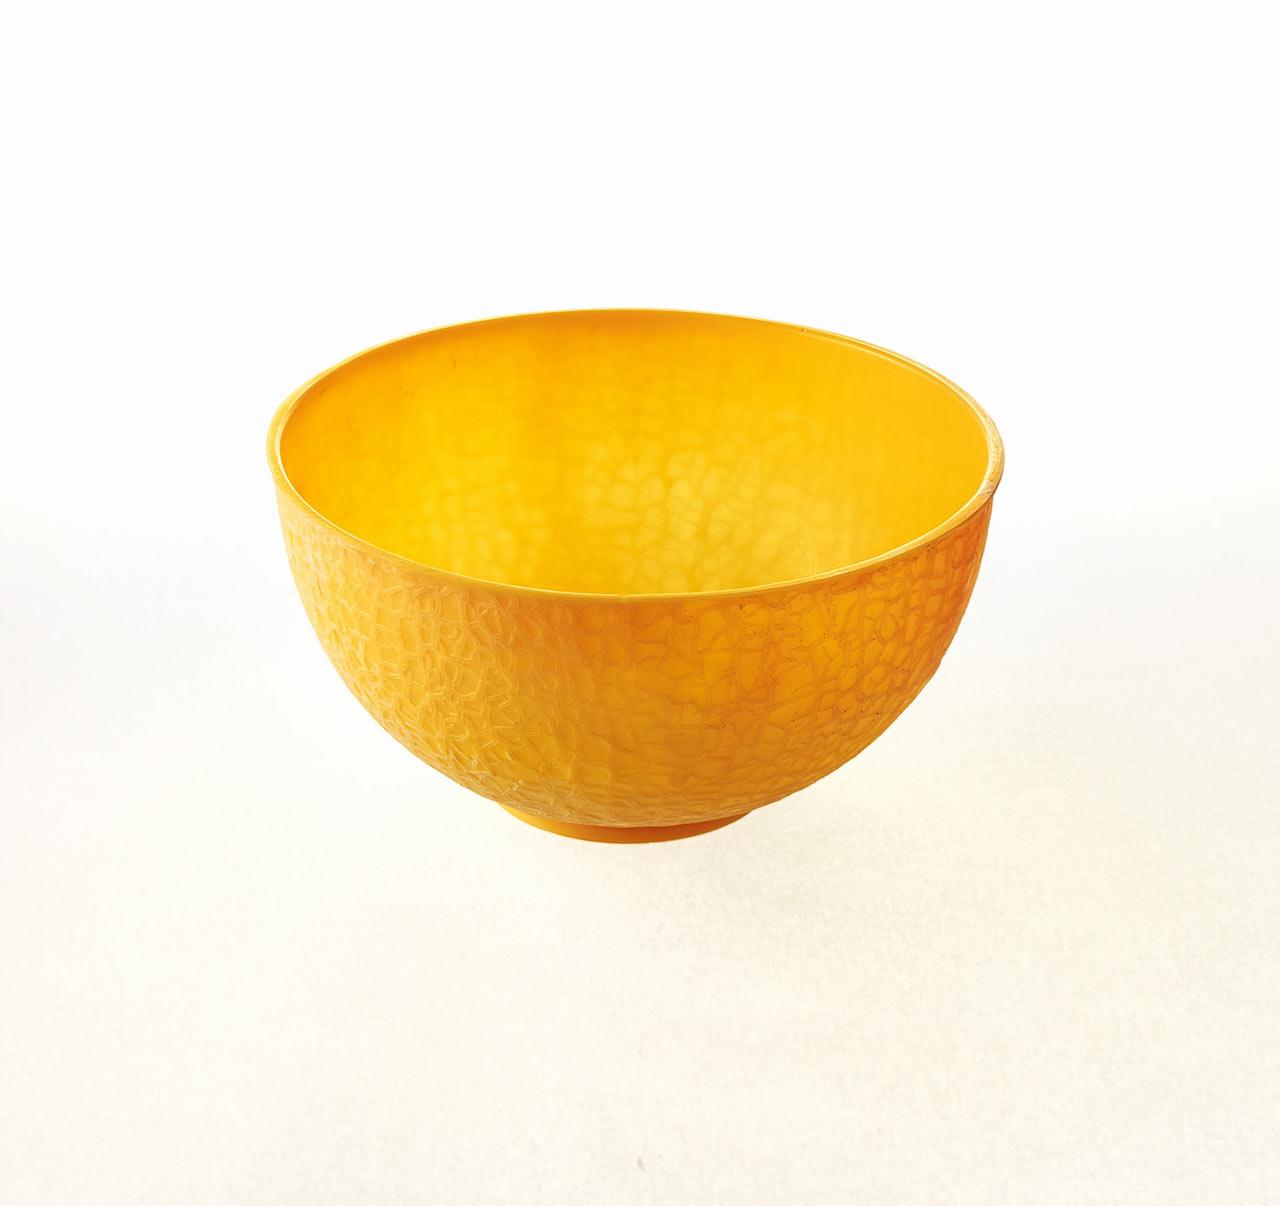 graft-plant-cutlery-7-bowl-honey-melon